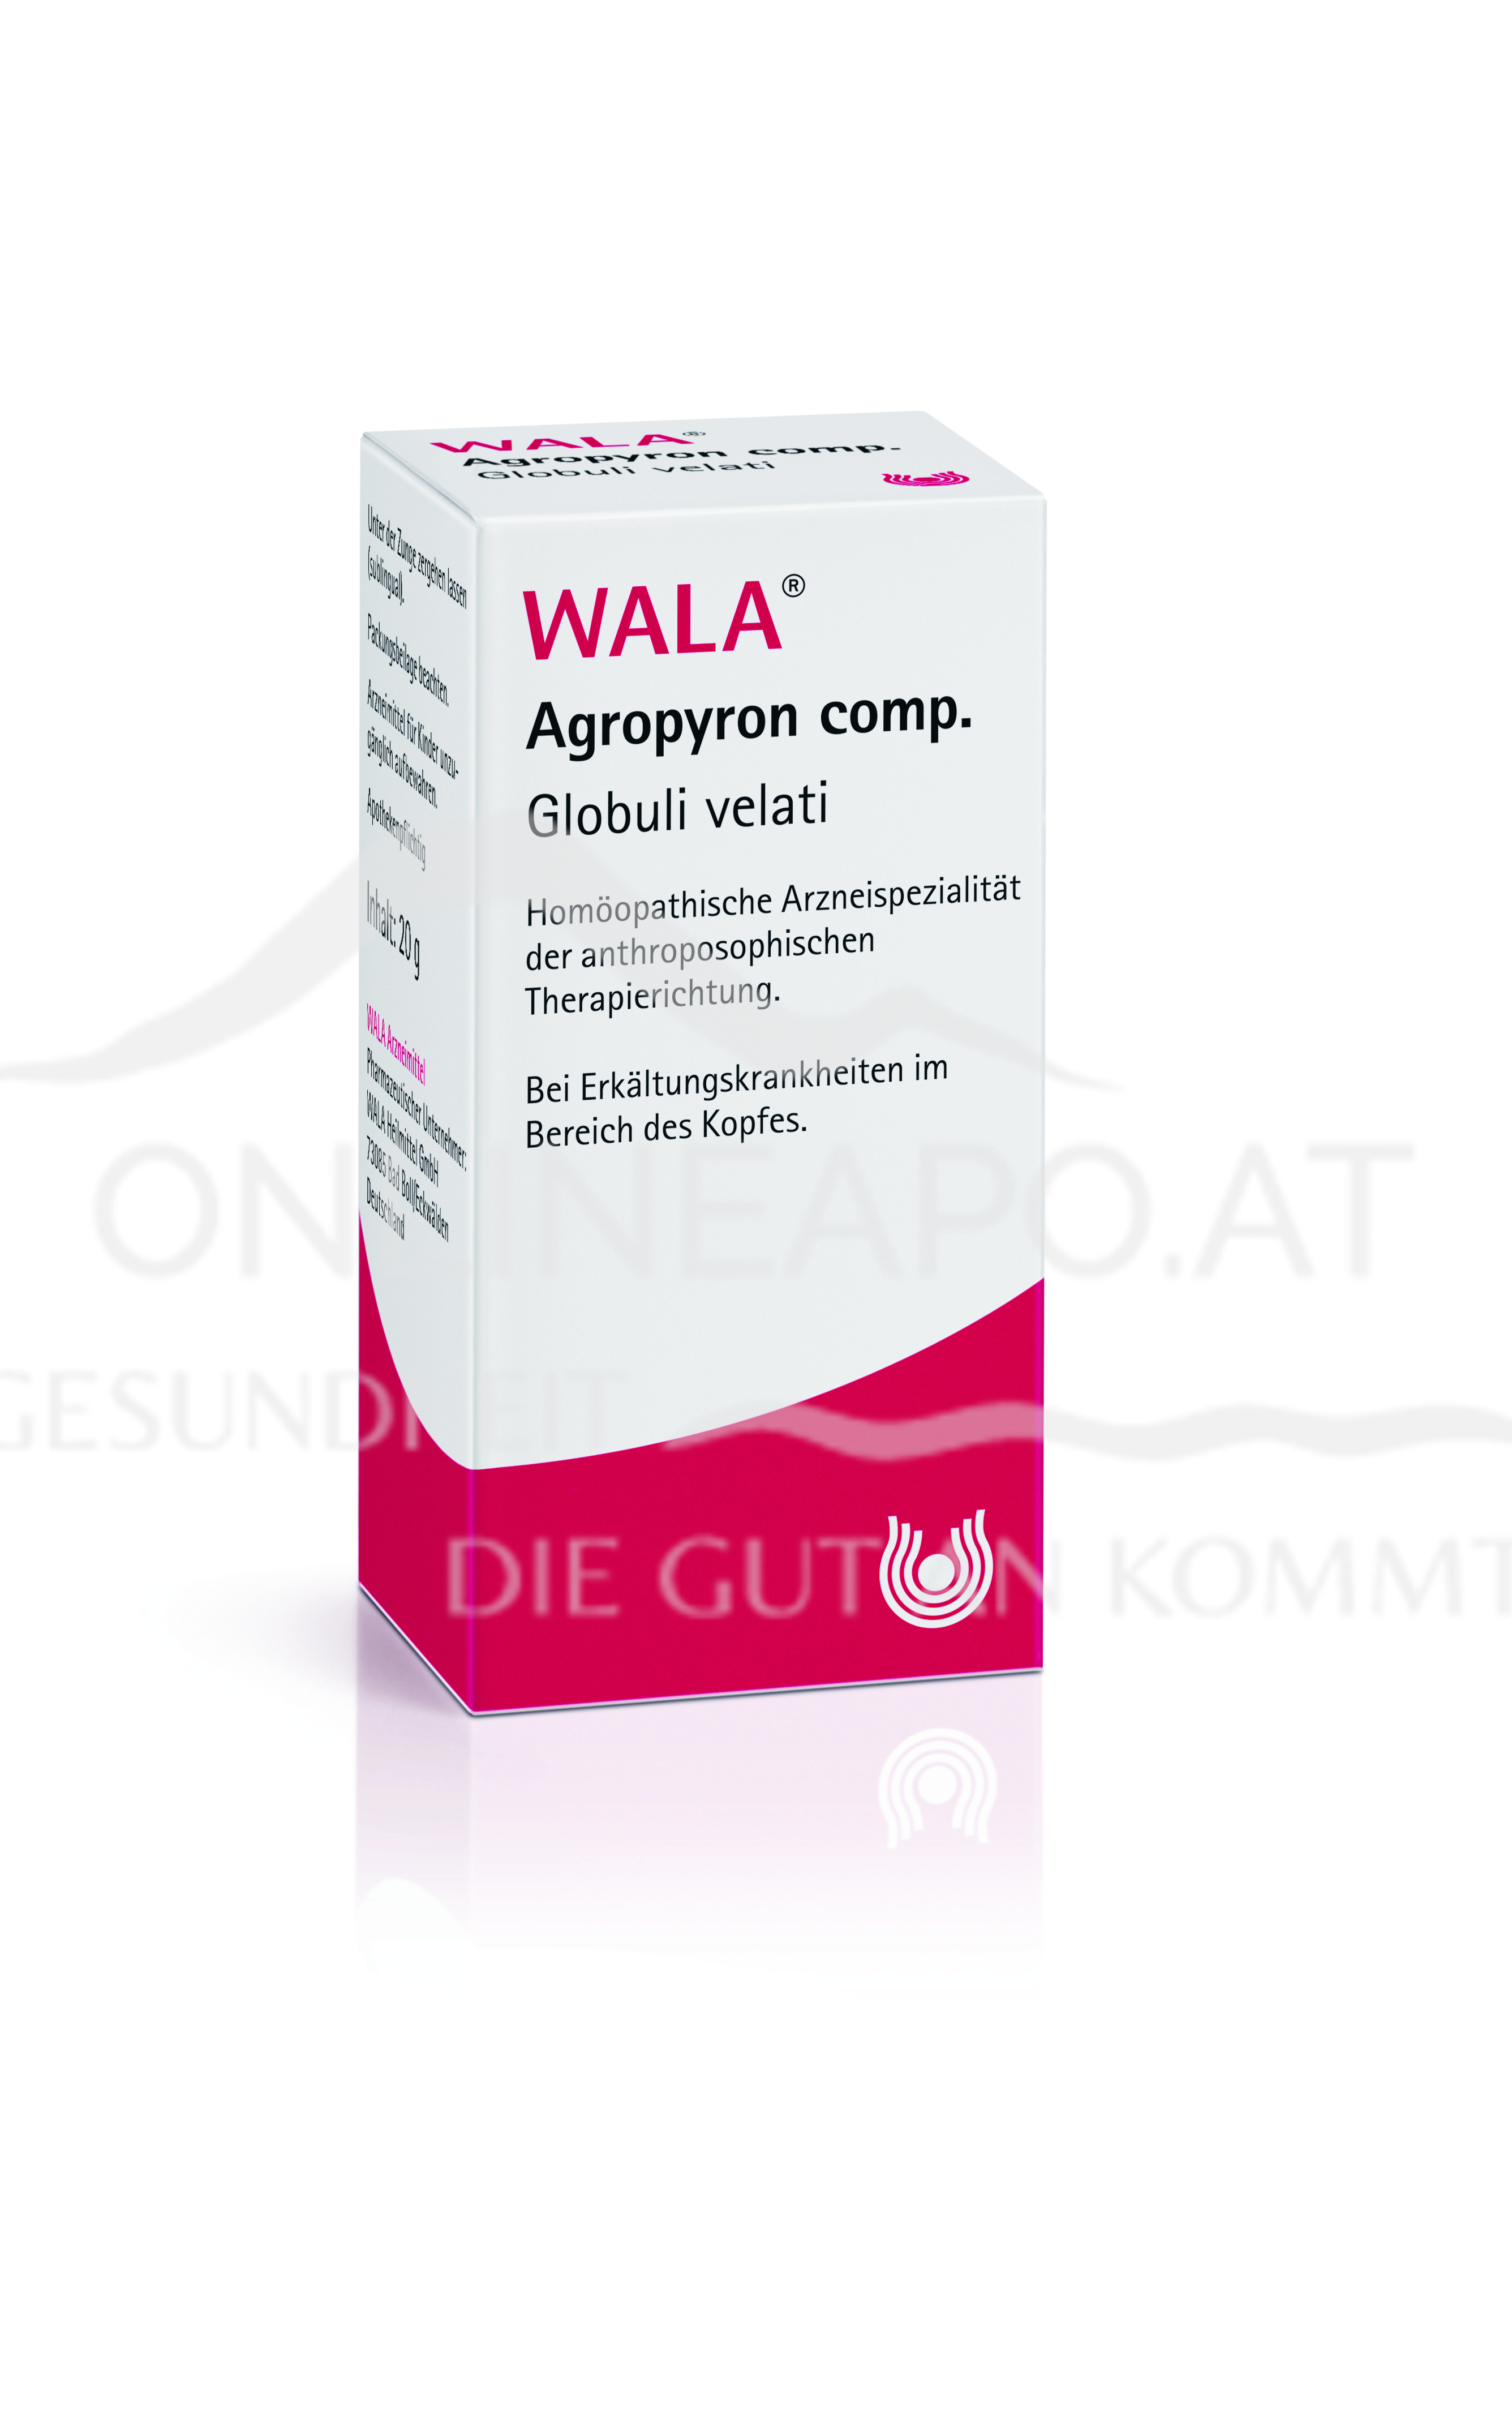 Wala Agropyron comp. Globuli velati